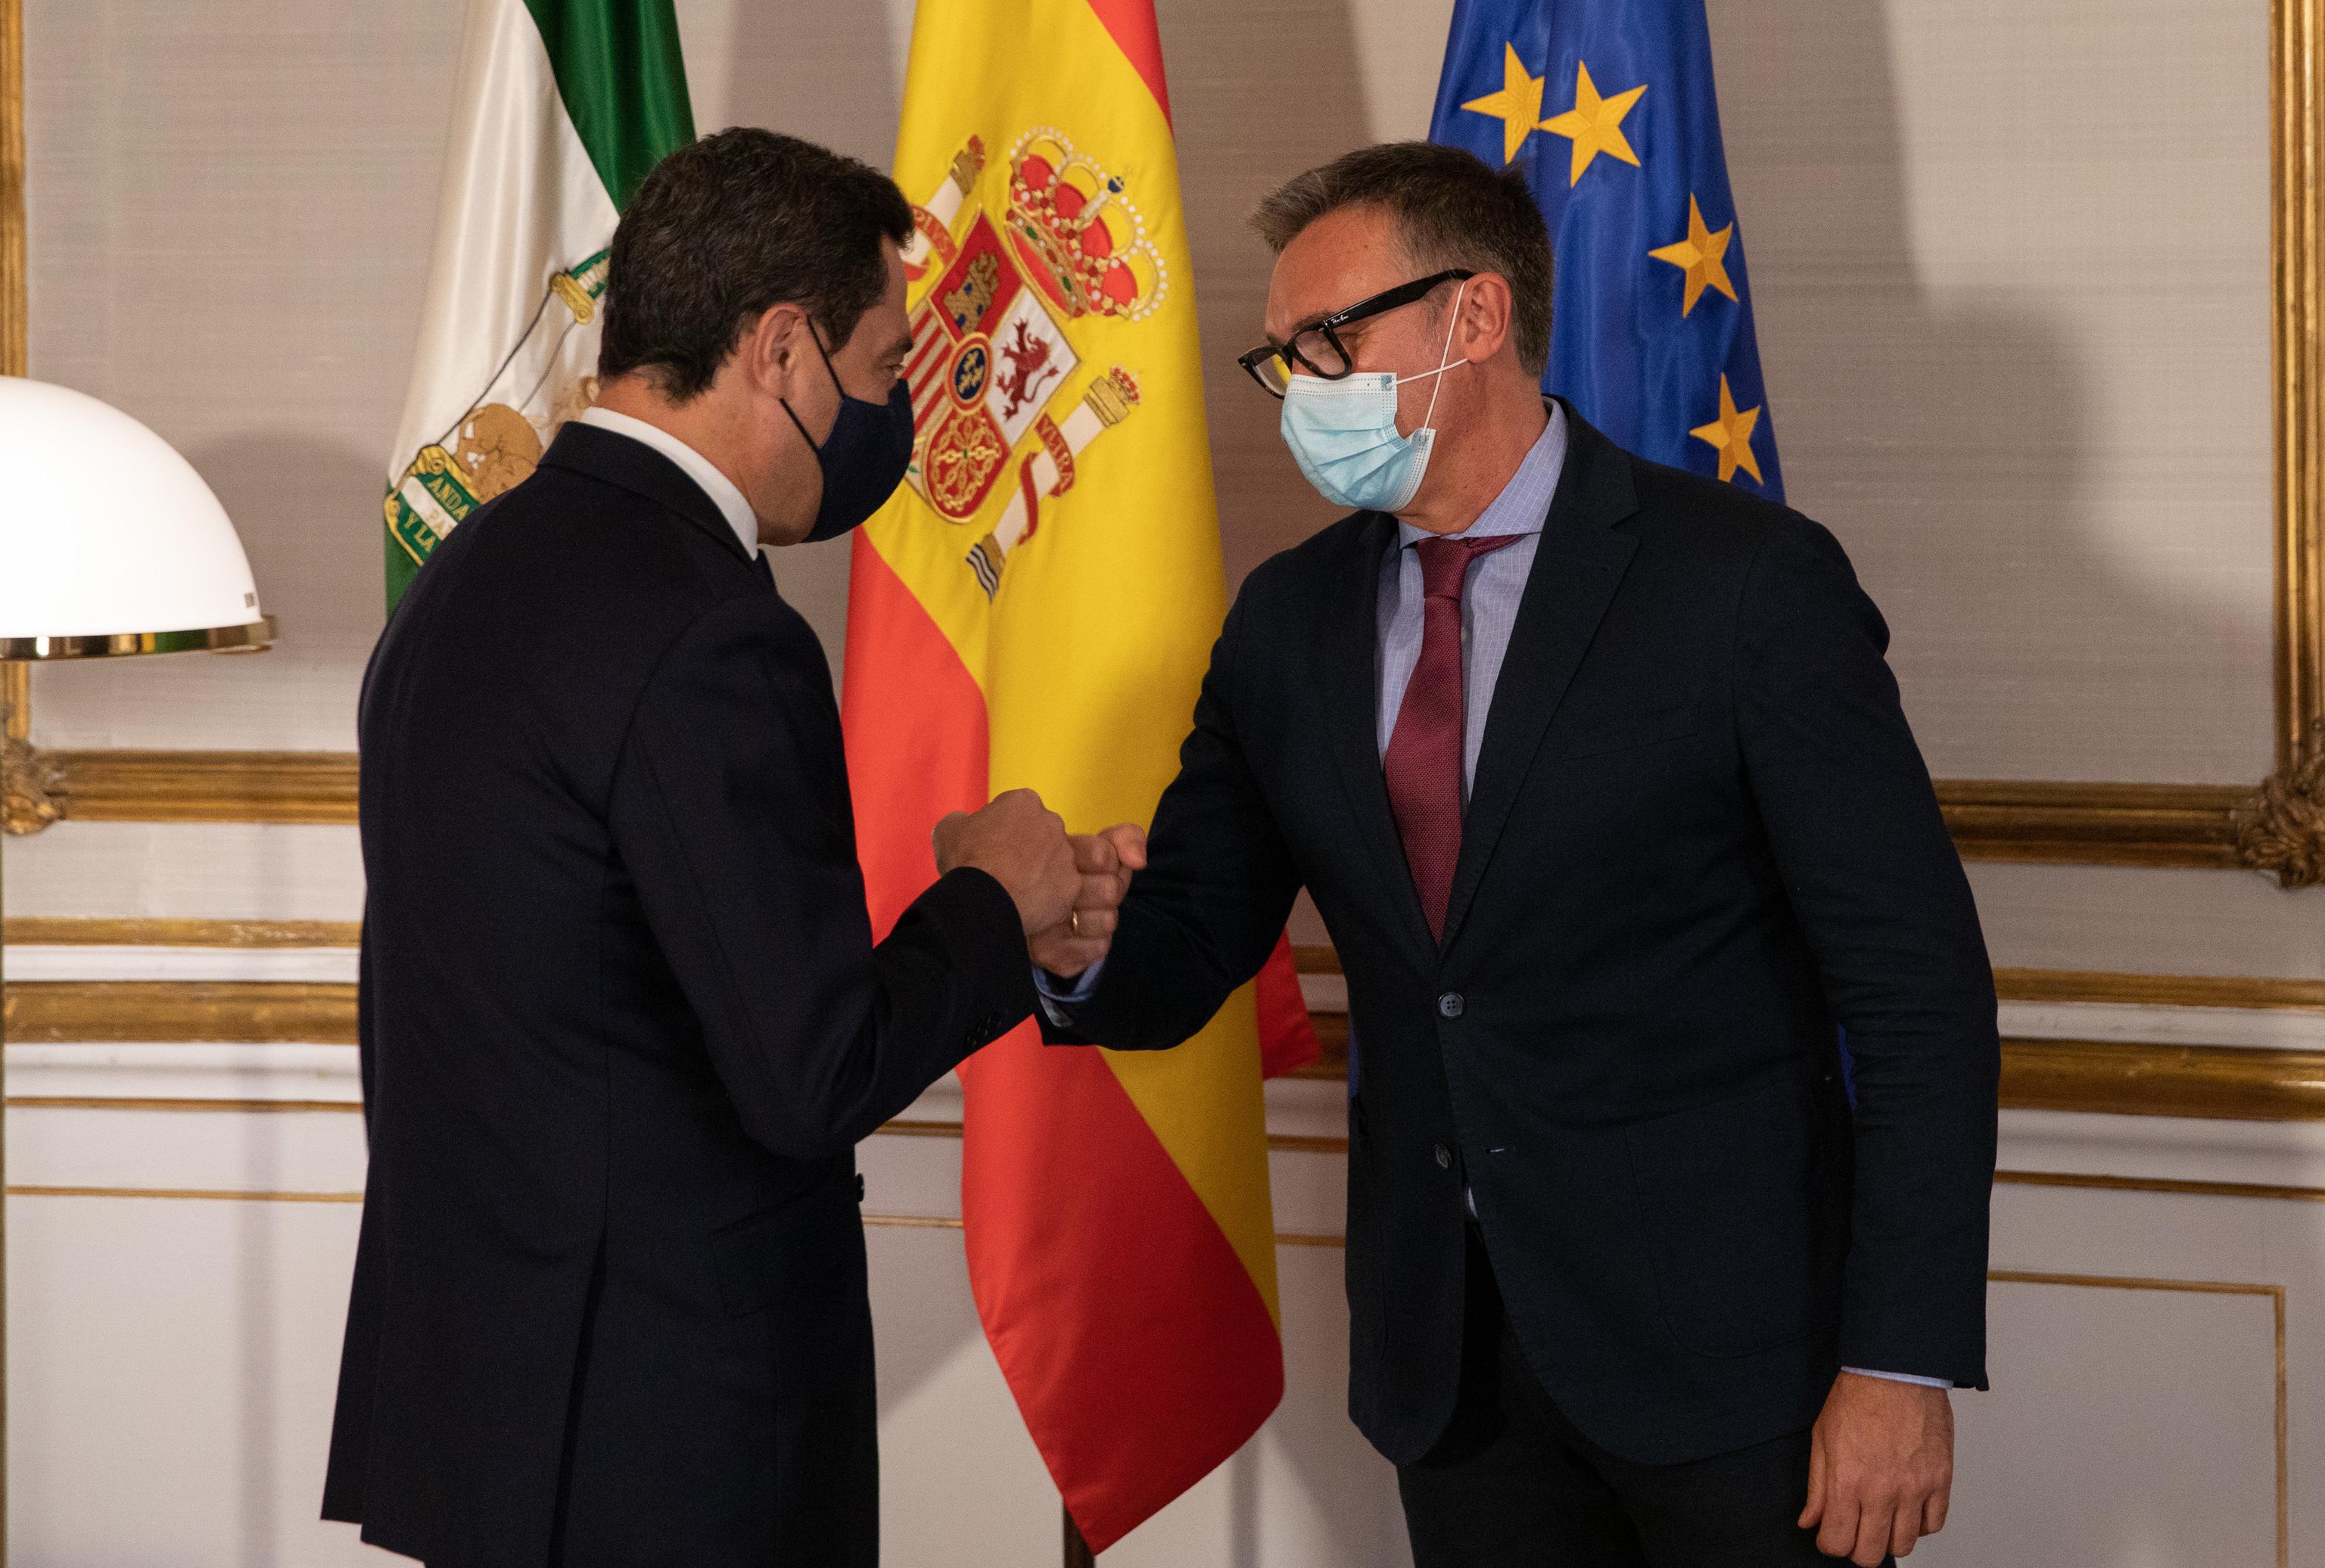 Juanma Moreno y Manuel Gavira (Vox).